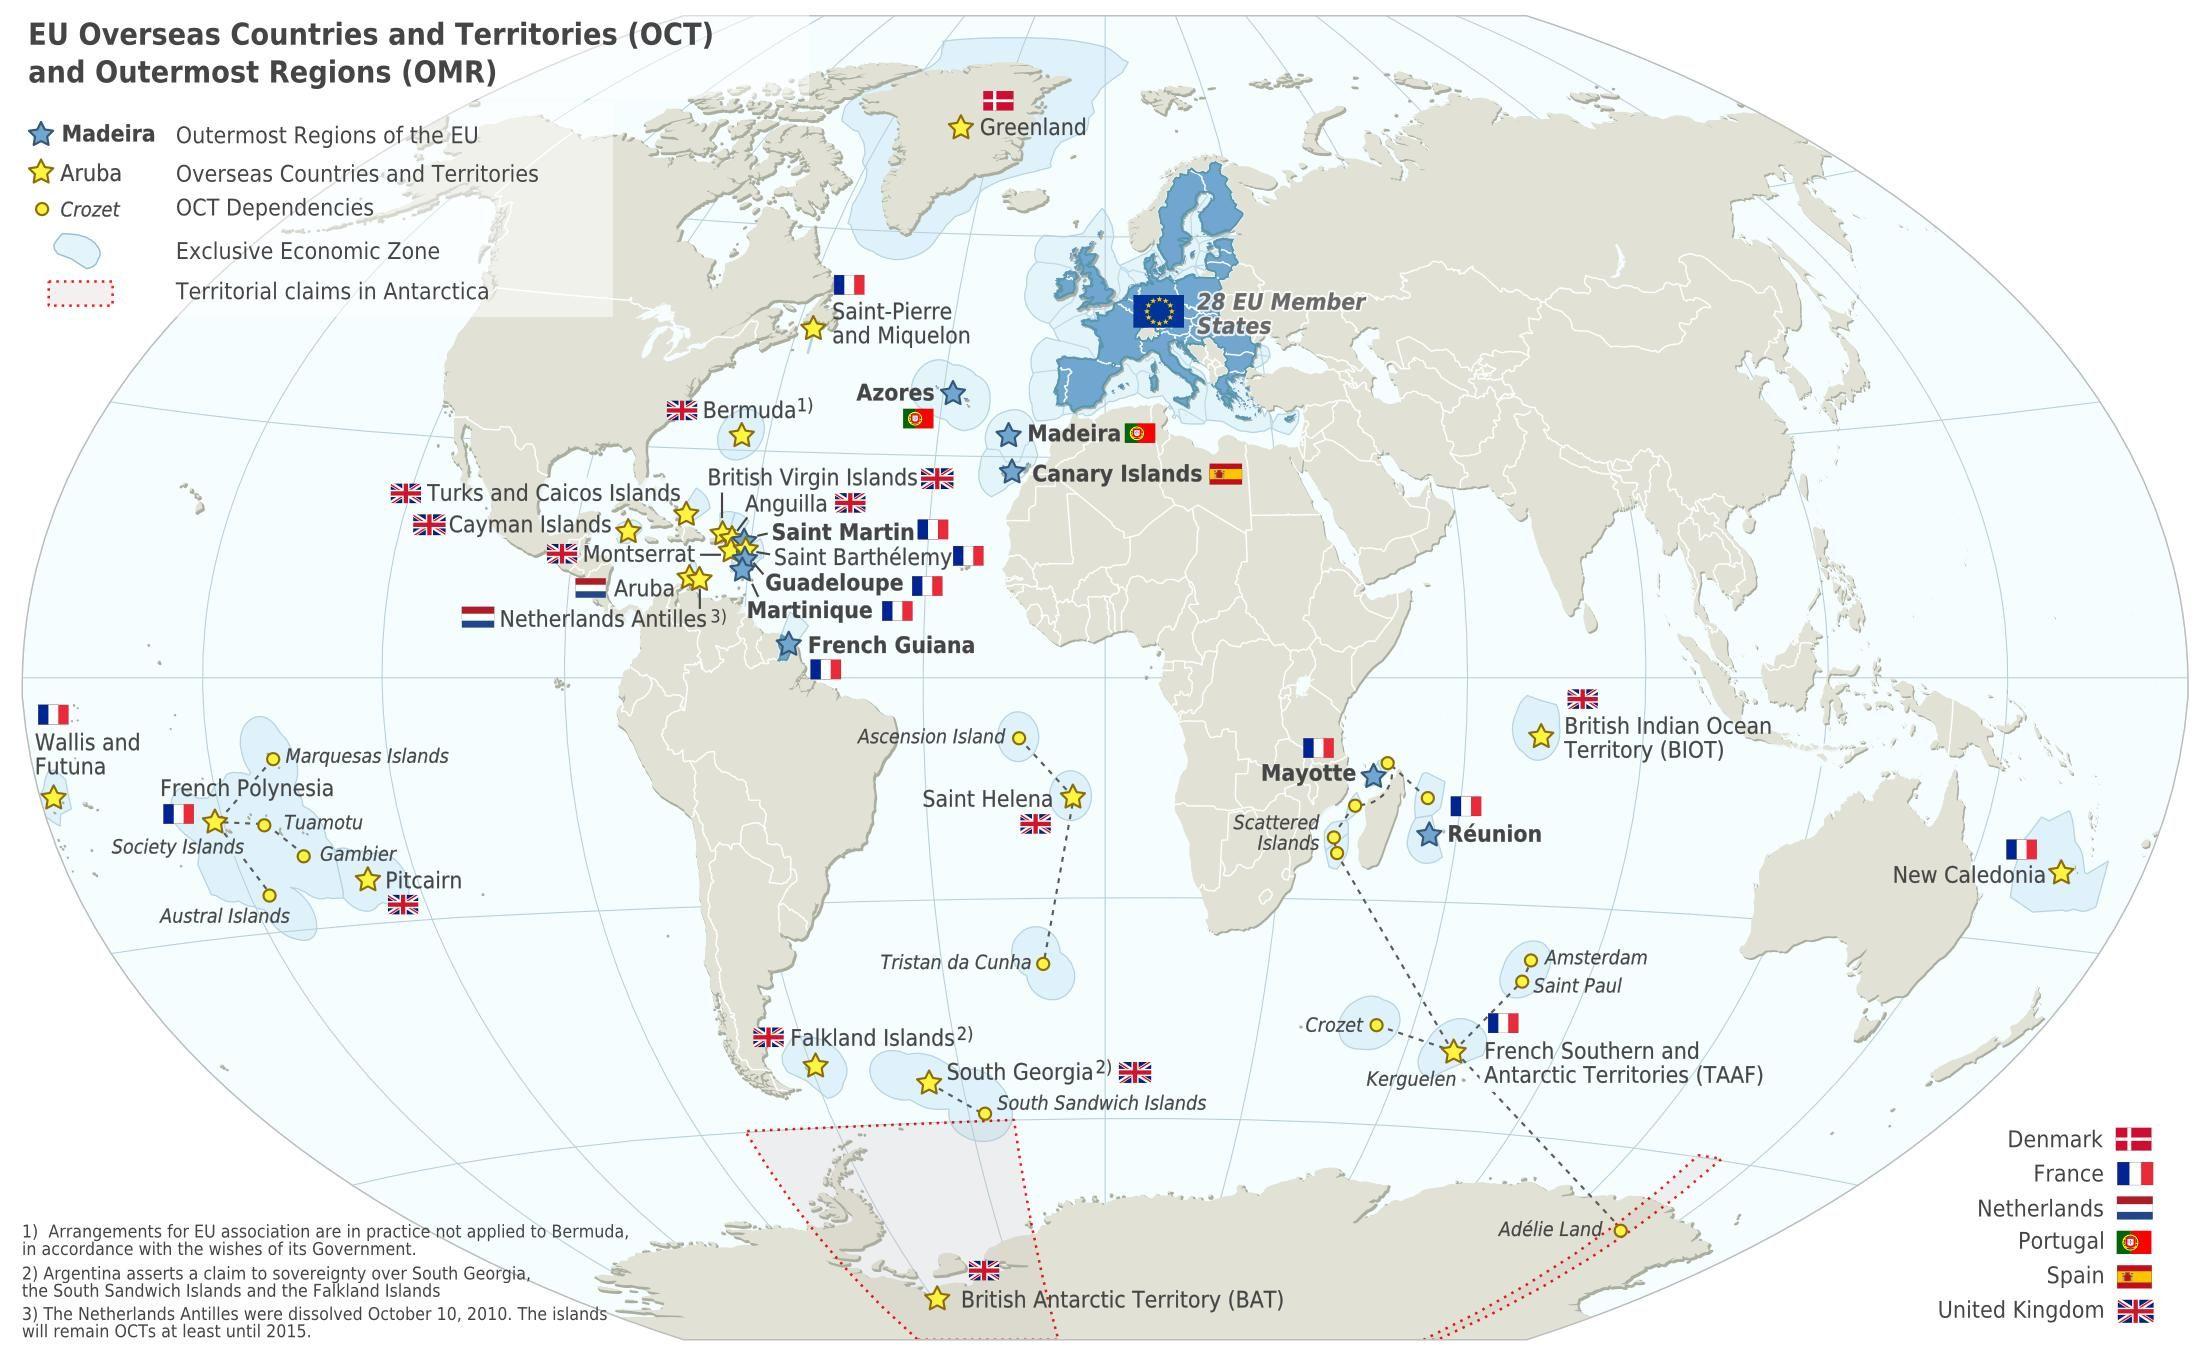 Eu overseas countries and territories map eu europe maps eu overseas countries and territories map eu europe gumiabroncs Gallery